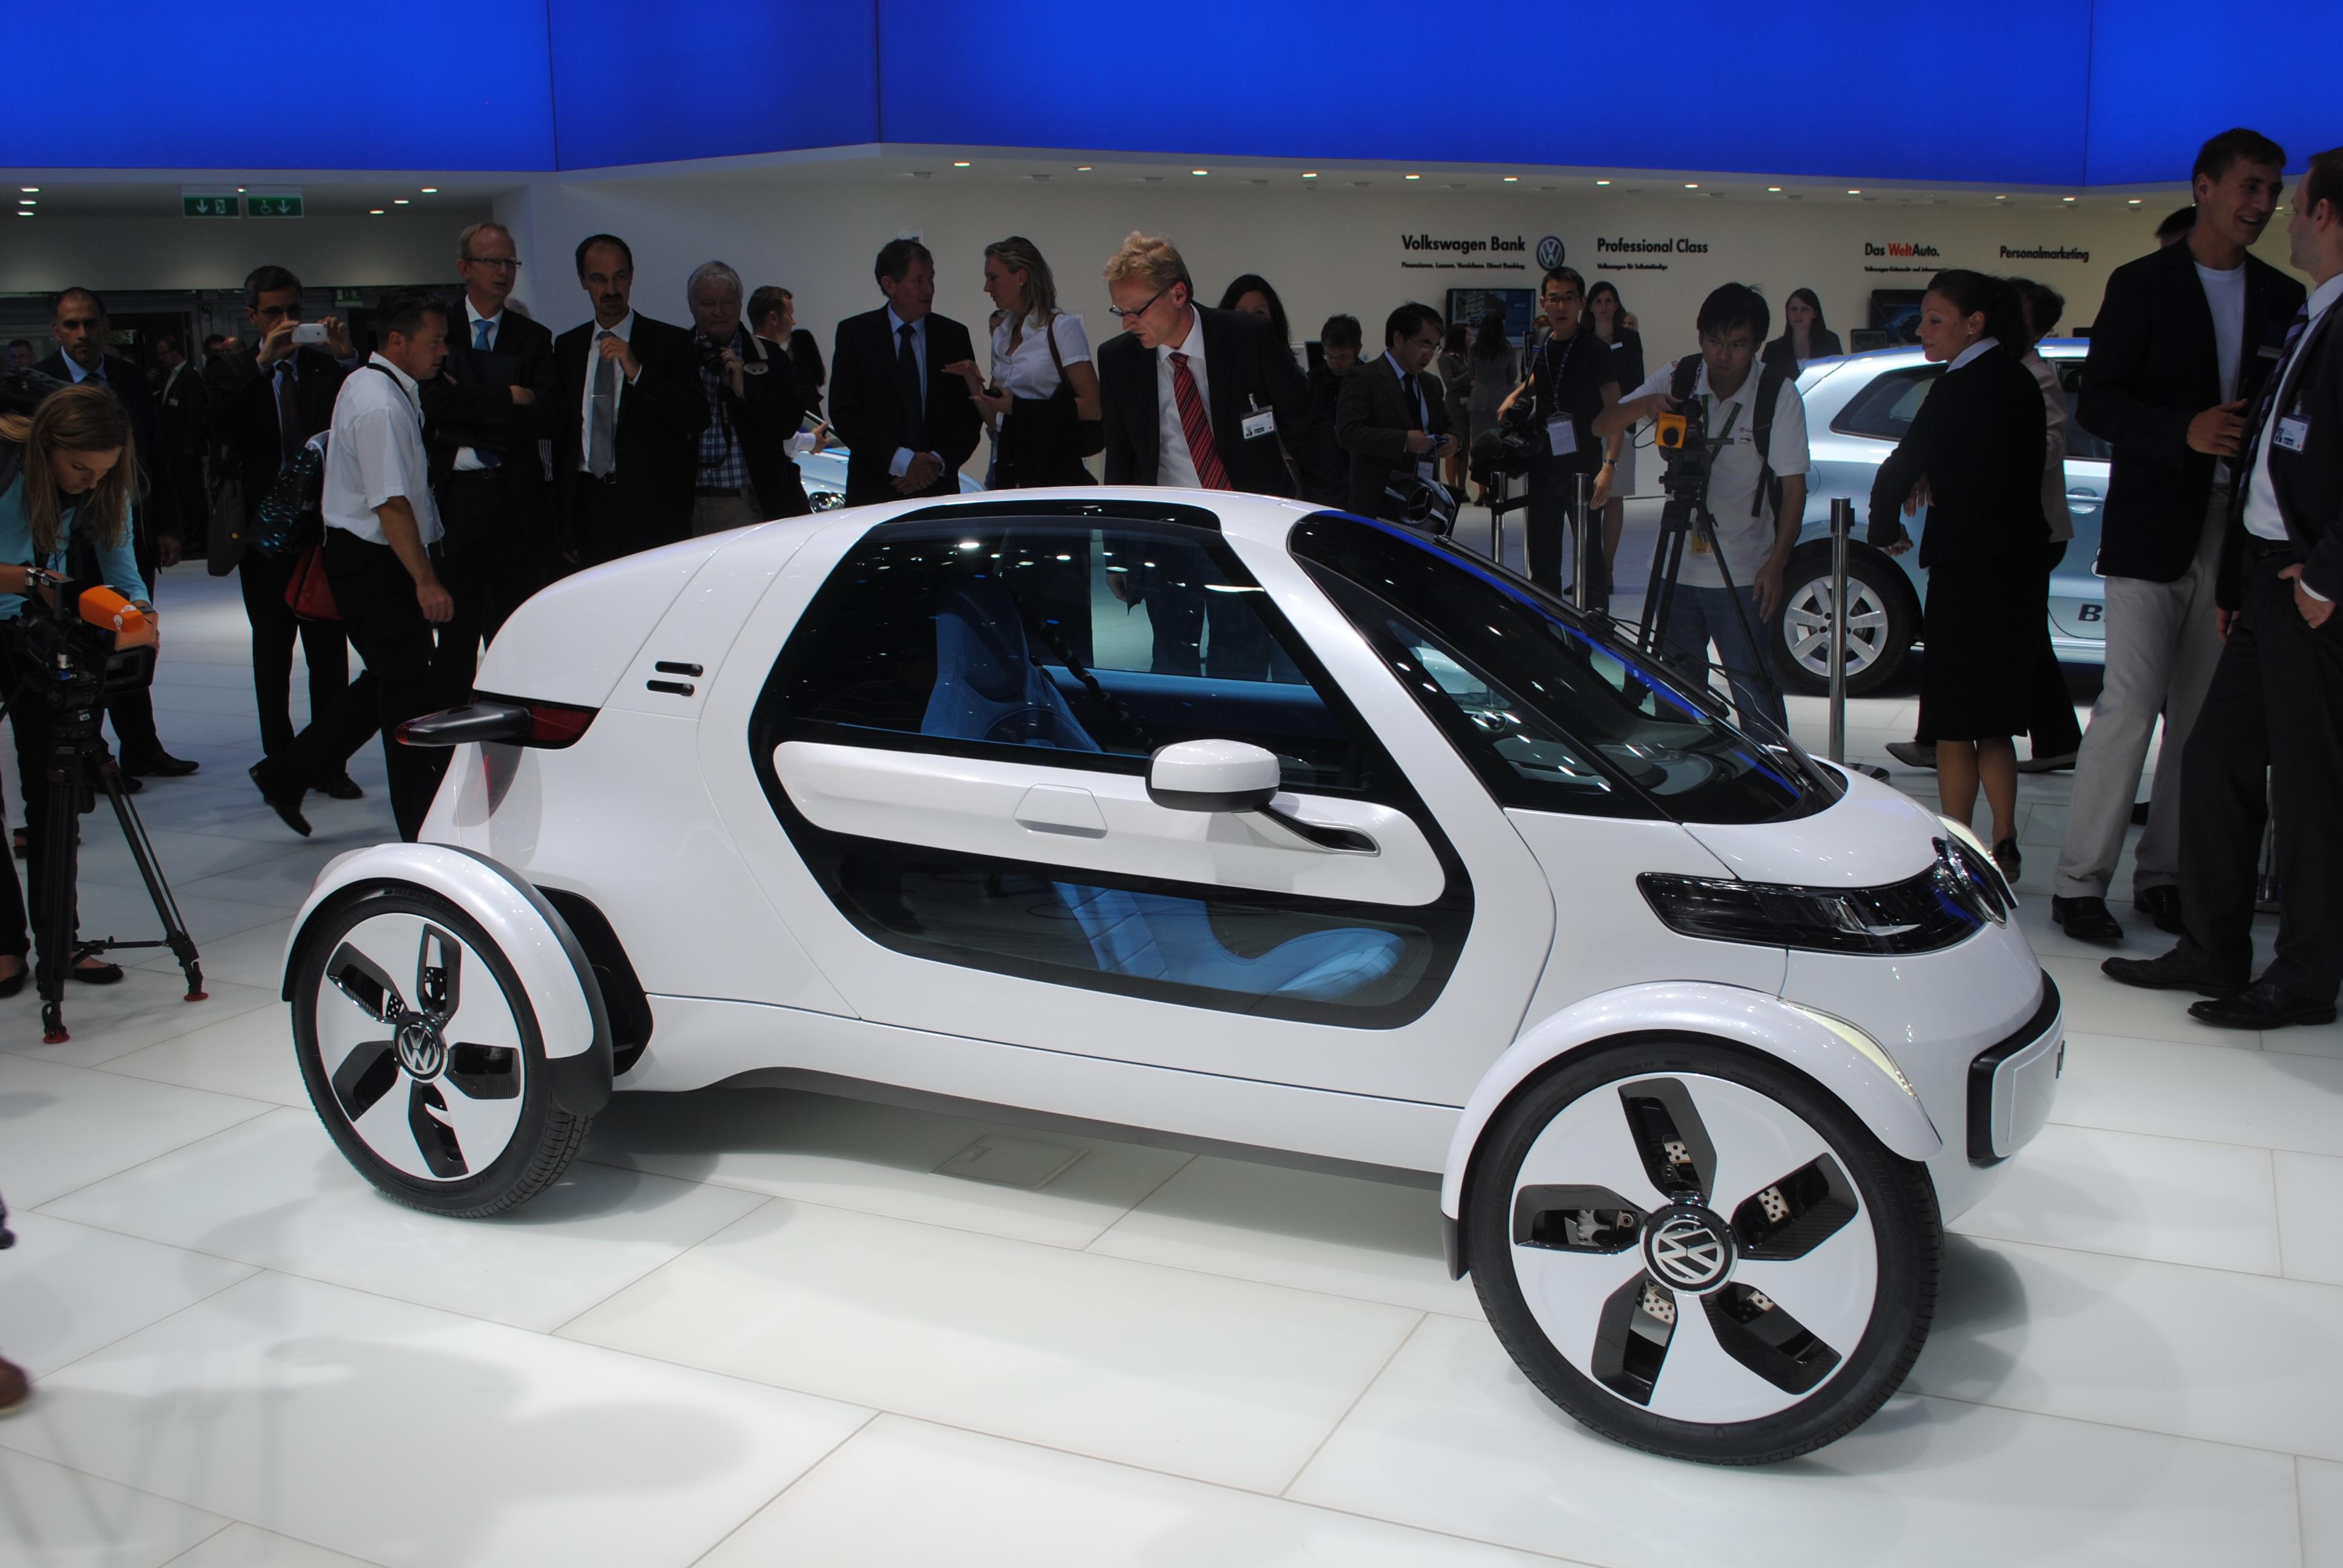 File:Volkswagen Nils Electric Car Concept At The Frankfurt